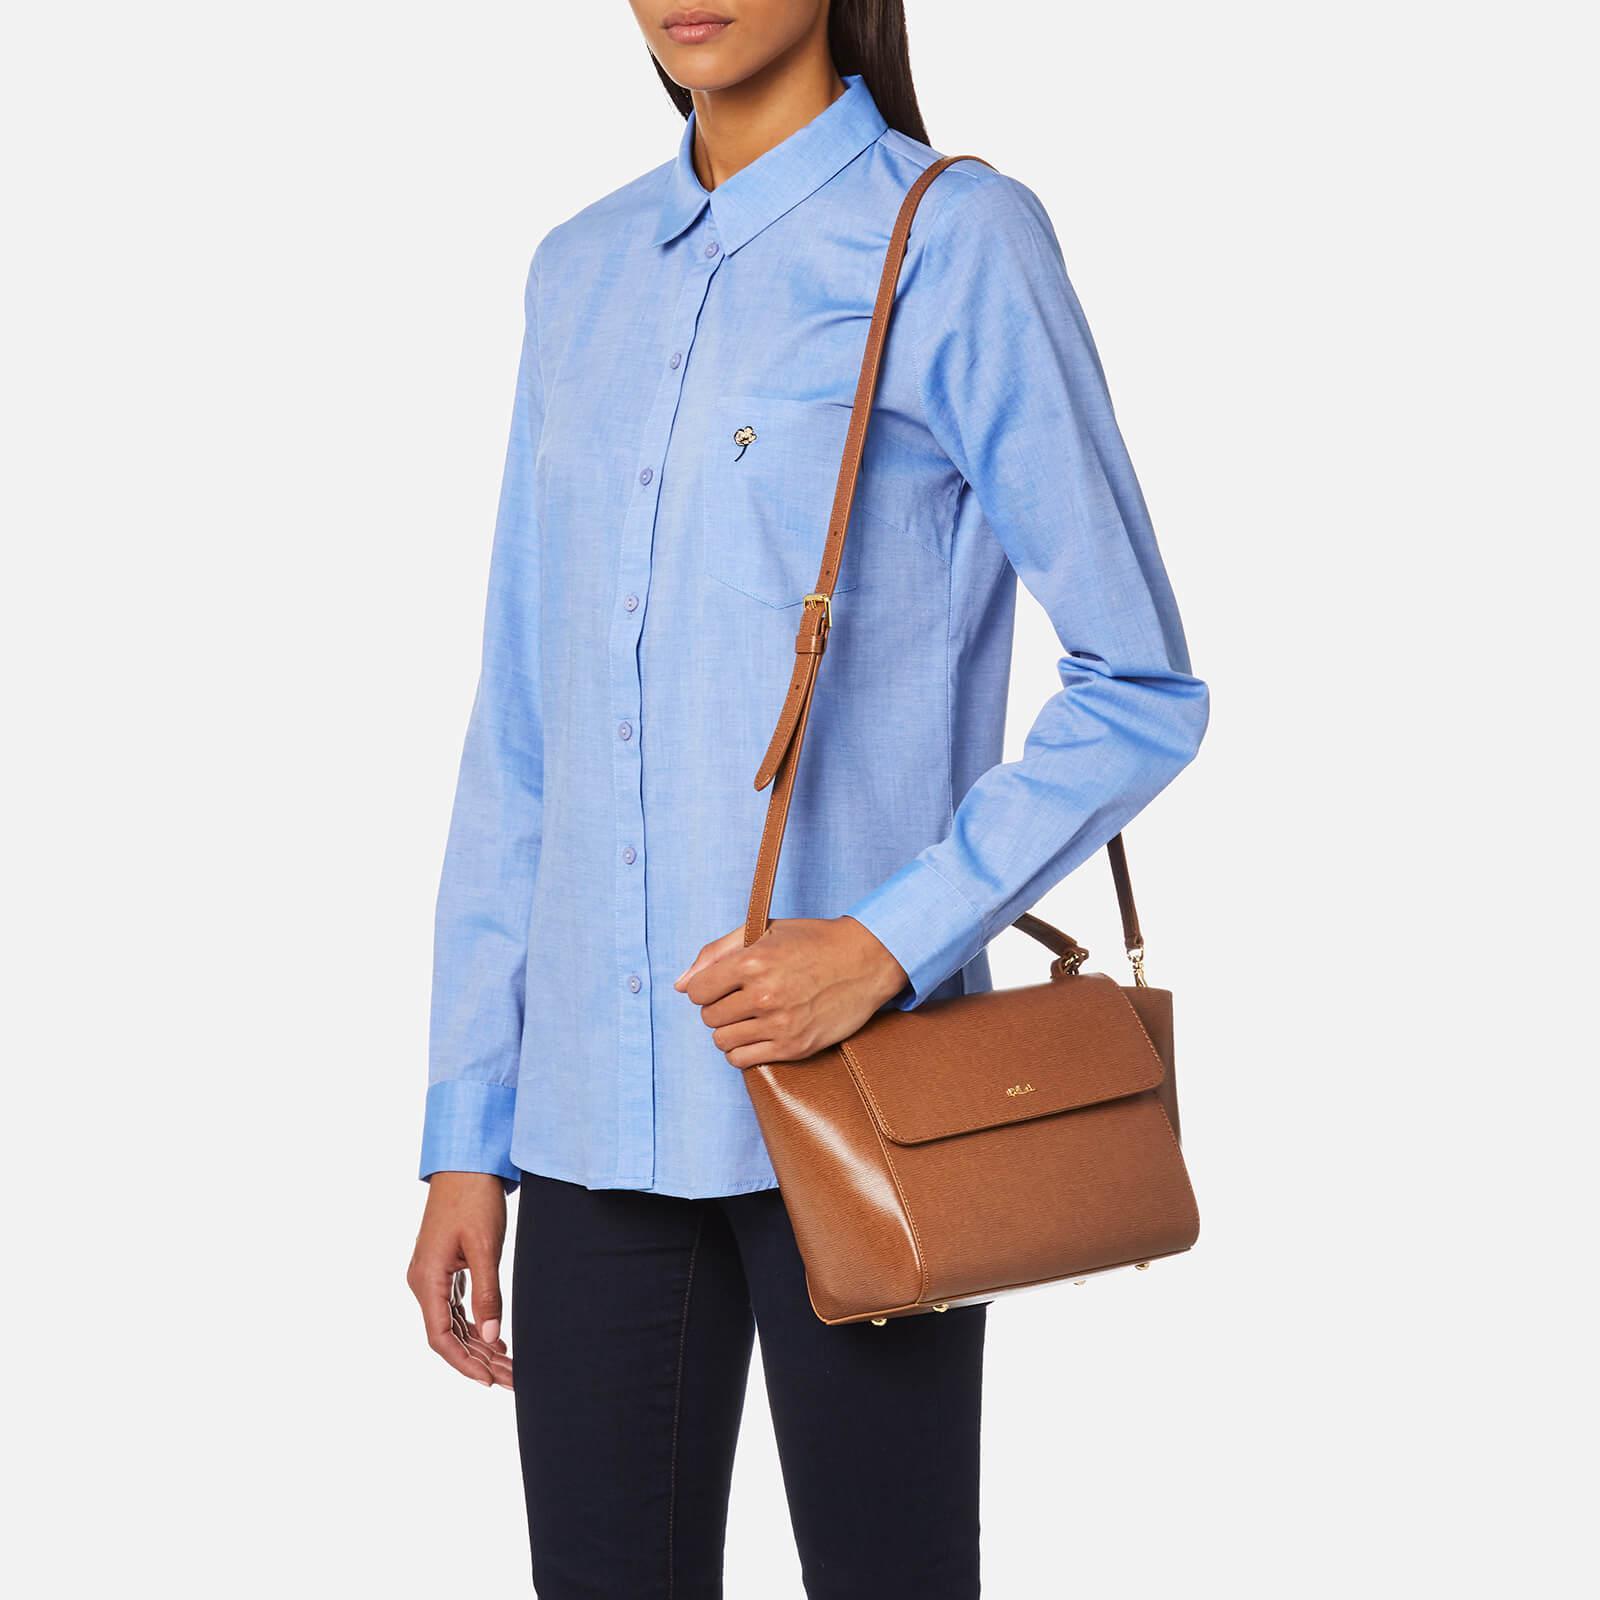 6d018add9b8f Lyst - Lauren by Ralph Lauren Newbury Barclay Cross Body Bag in Brown